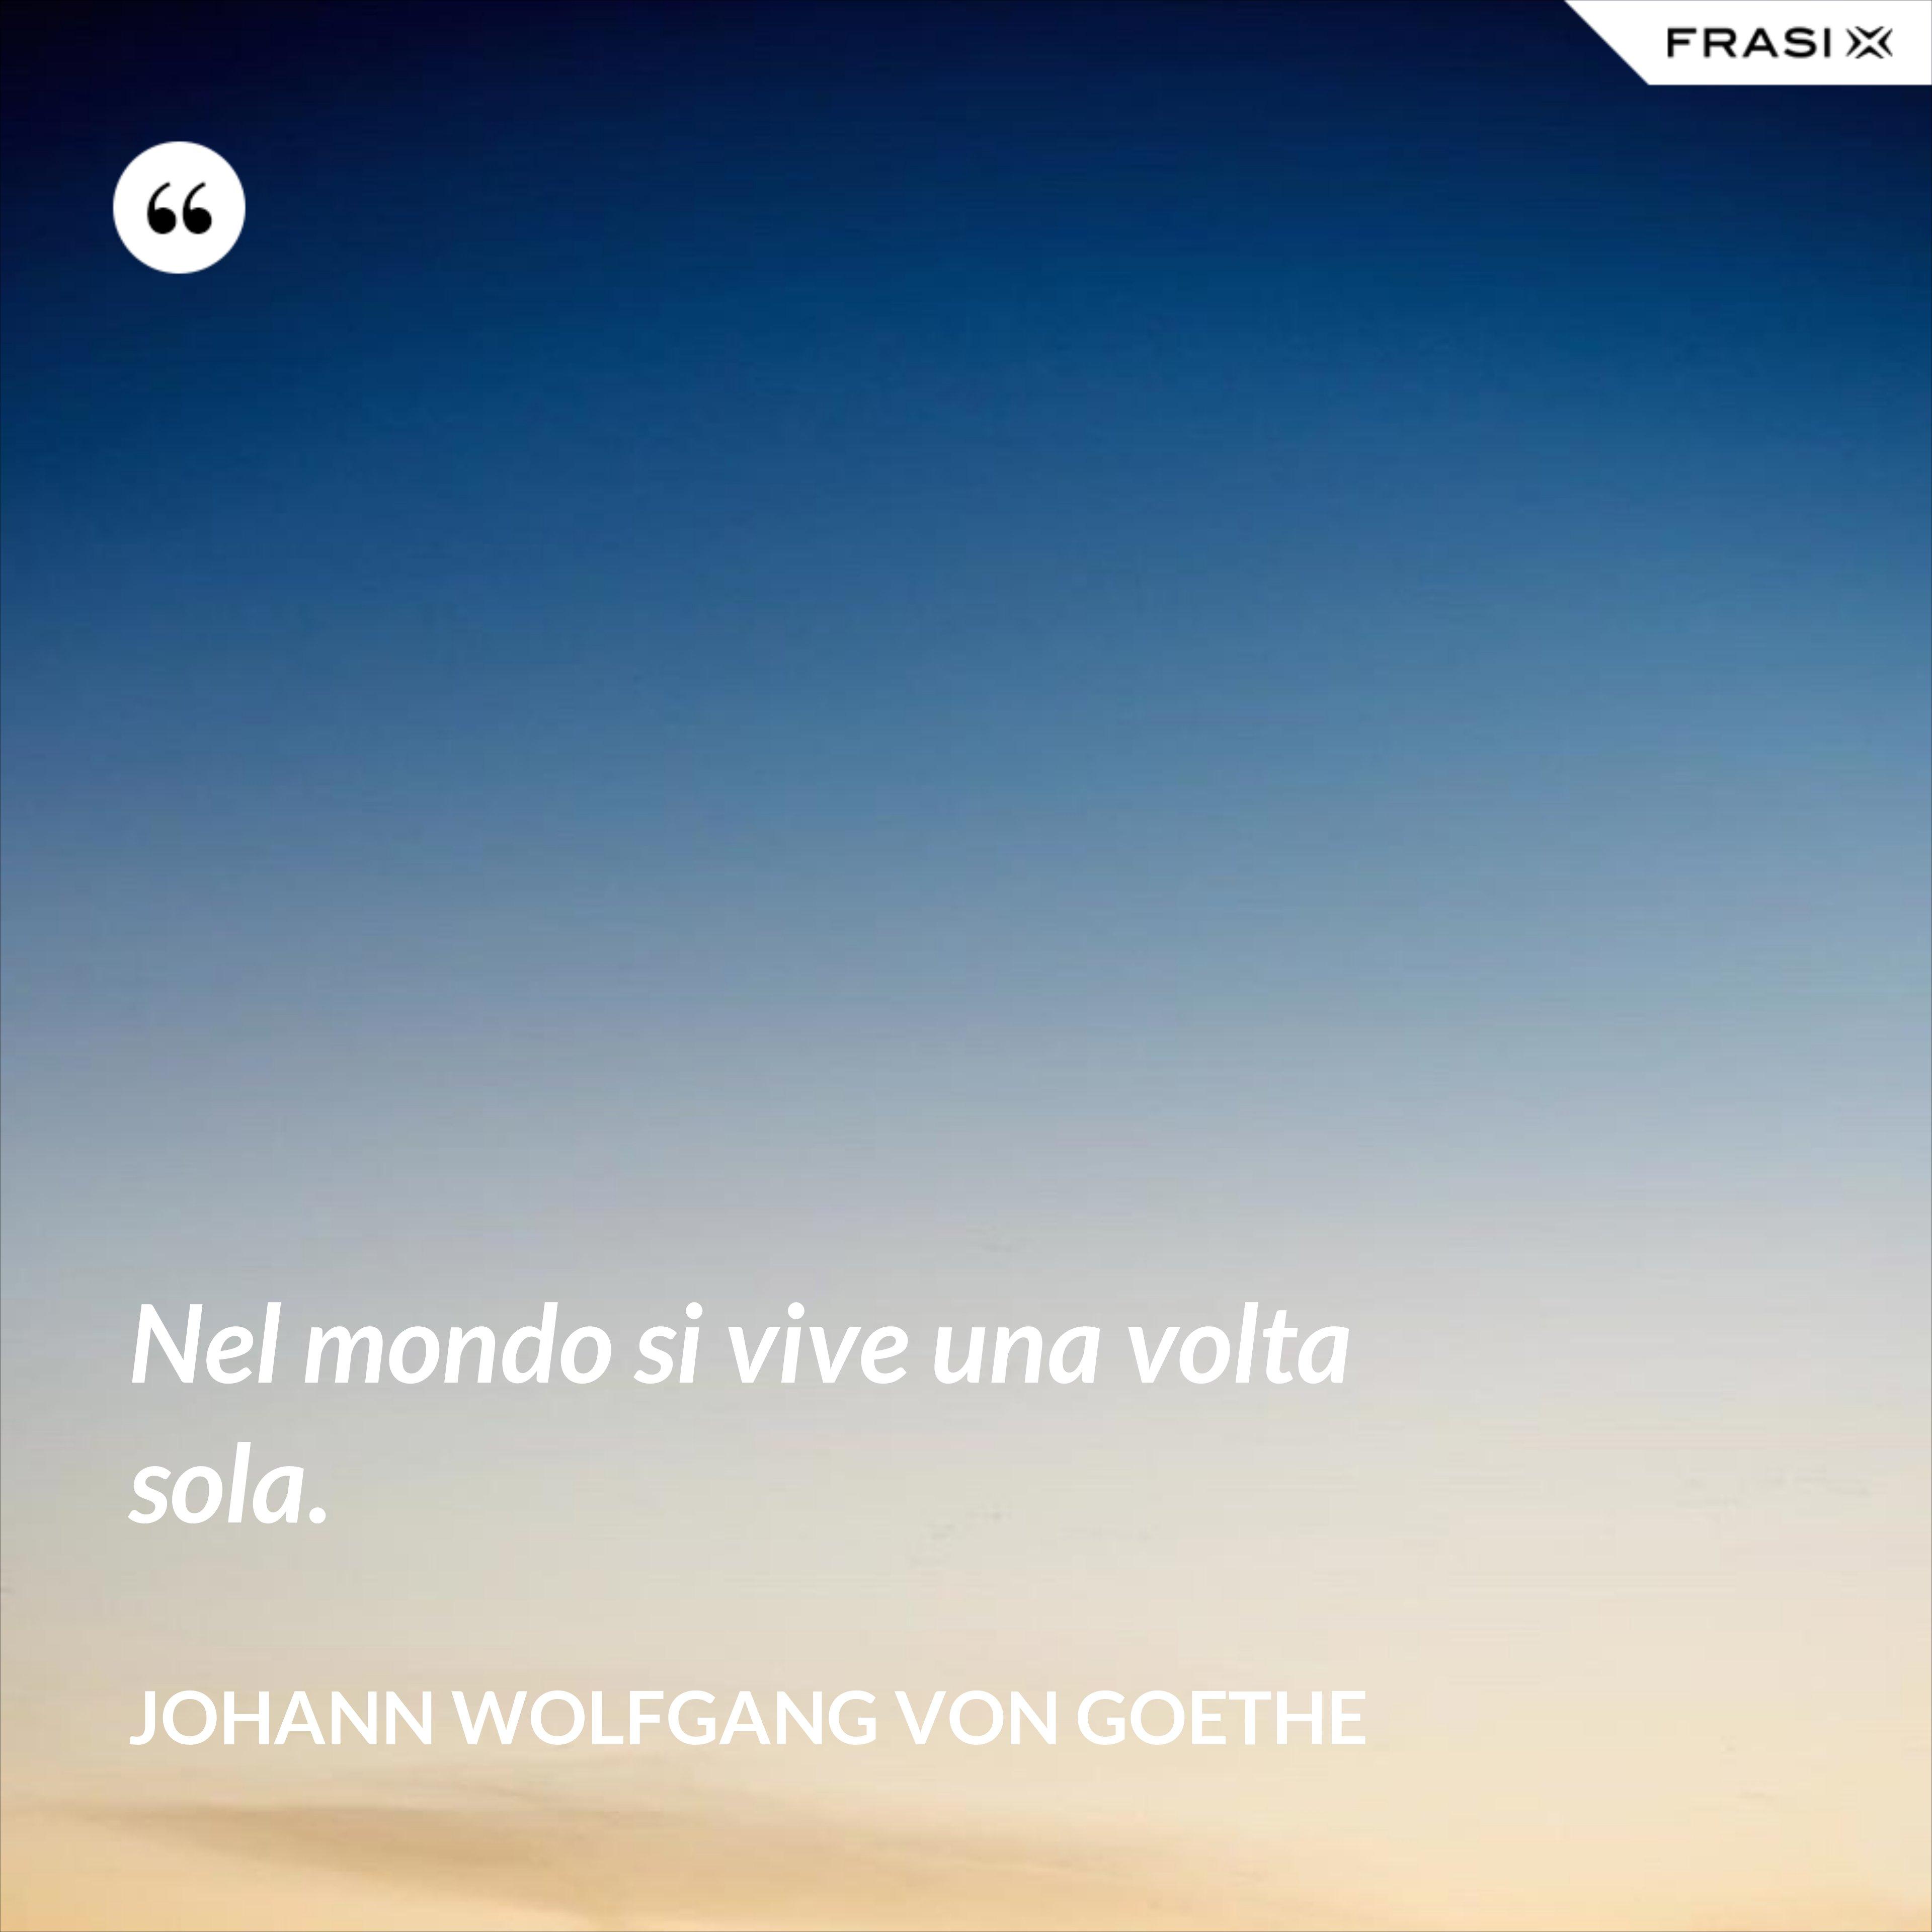 Nel mondo si vive una volta sola. - Johann Wolfgang von Goethe